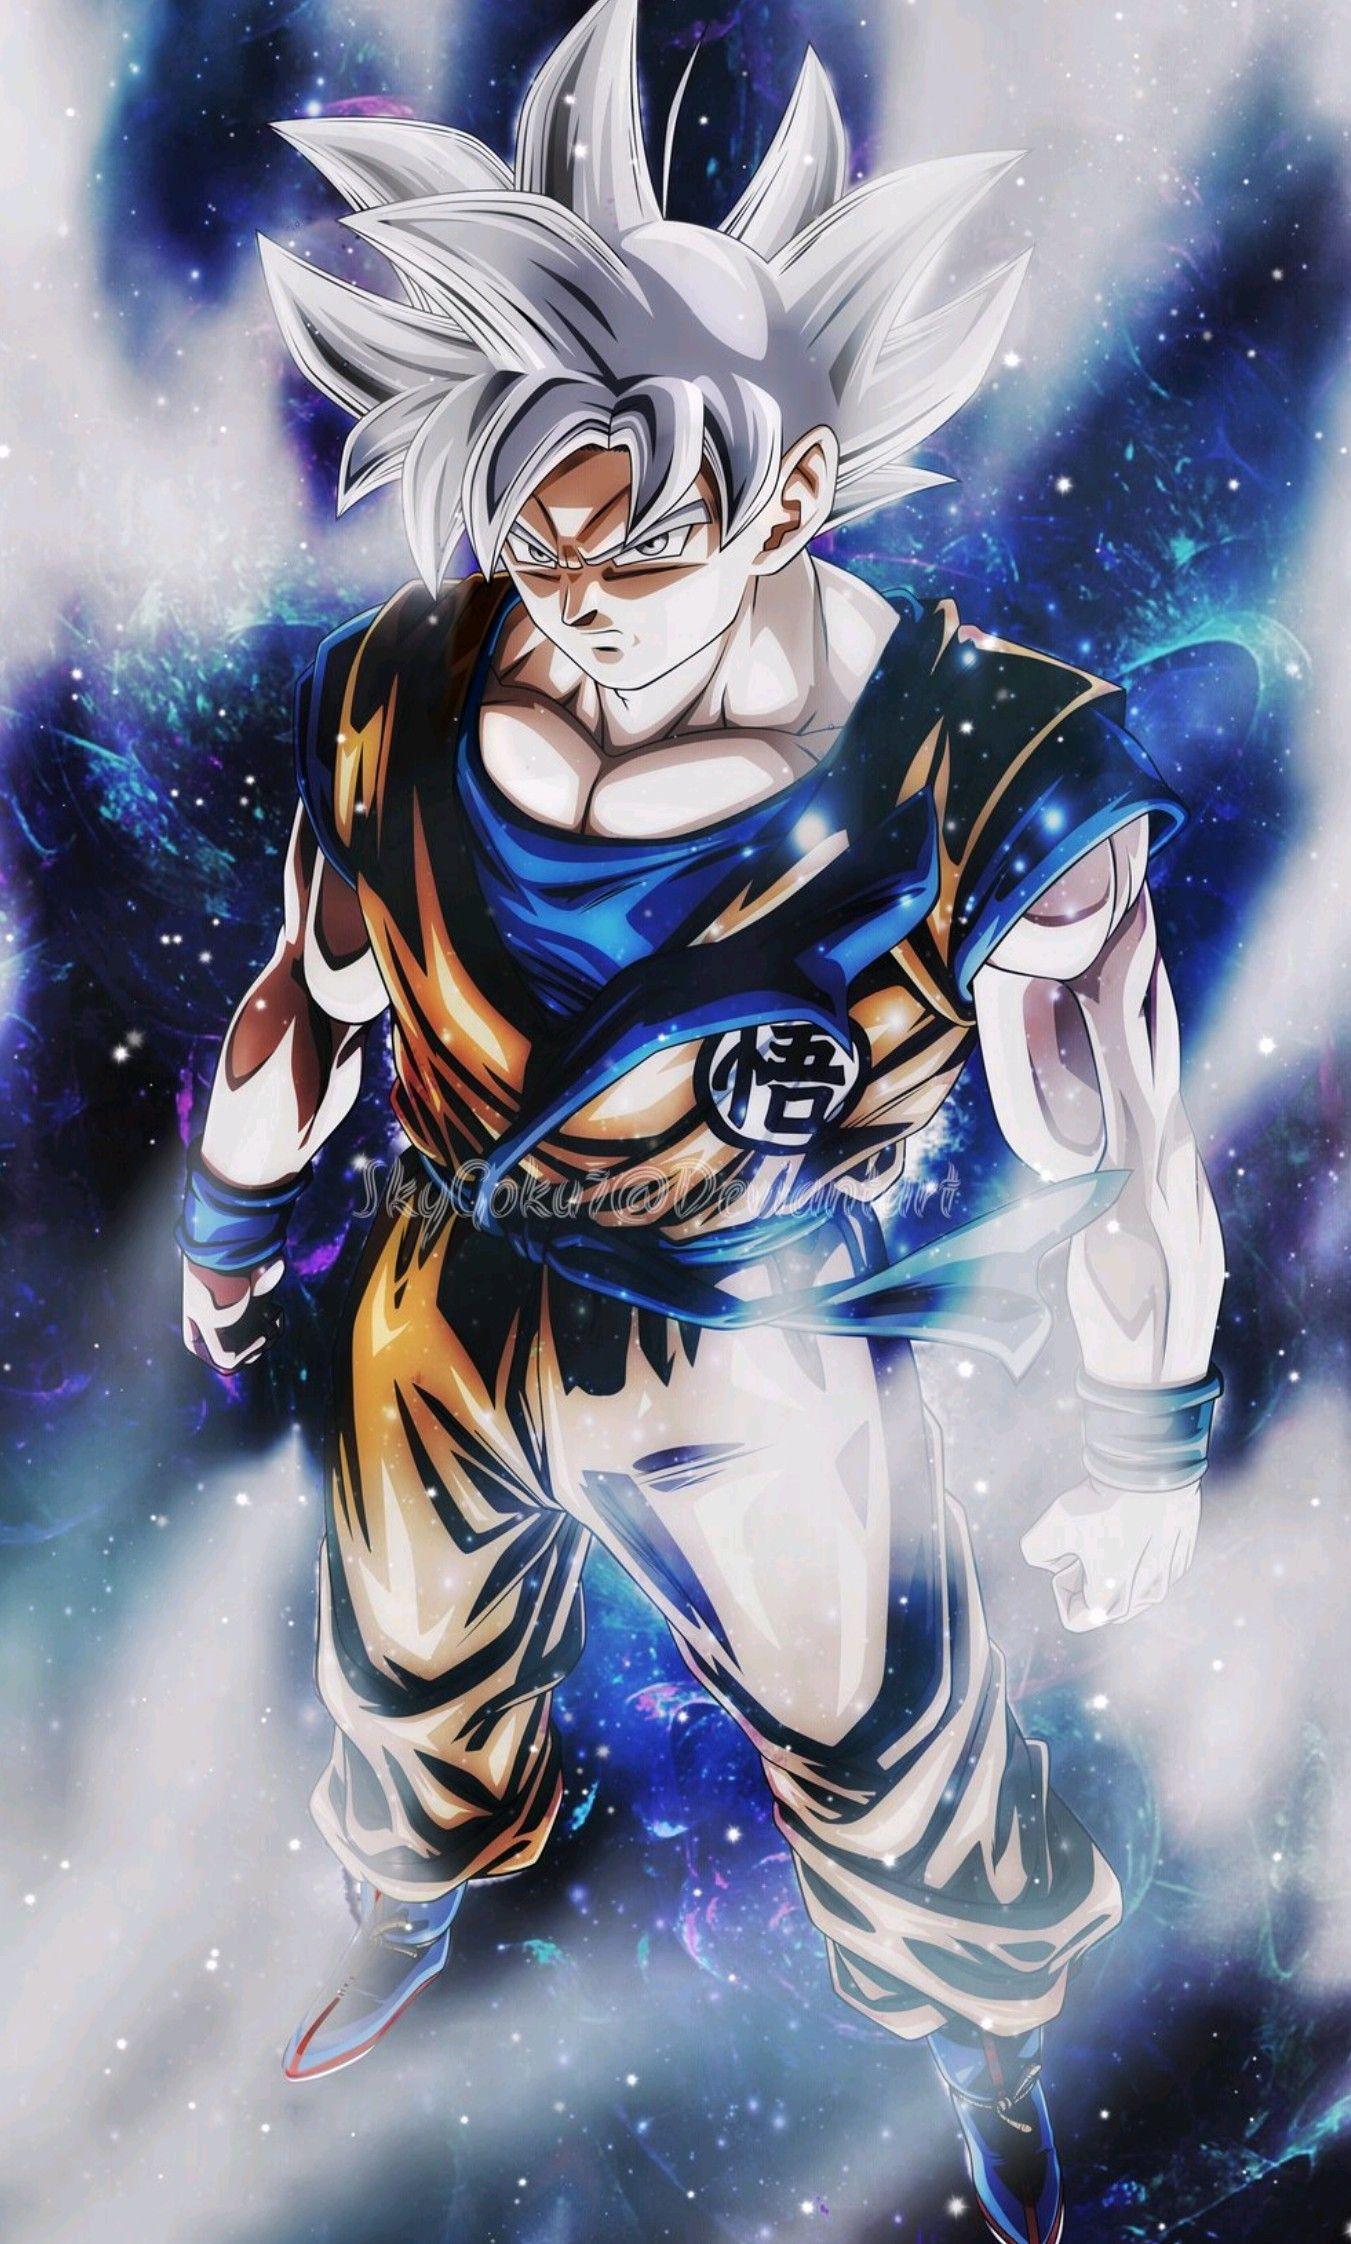 1351x2244 Elegant Ultra Instinct Goku Wallpaper Mastered Dragon Ball Goku Dragon Ball Super Goku Anime Dragon Ball Super